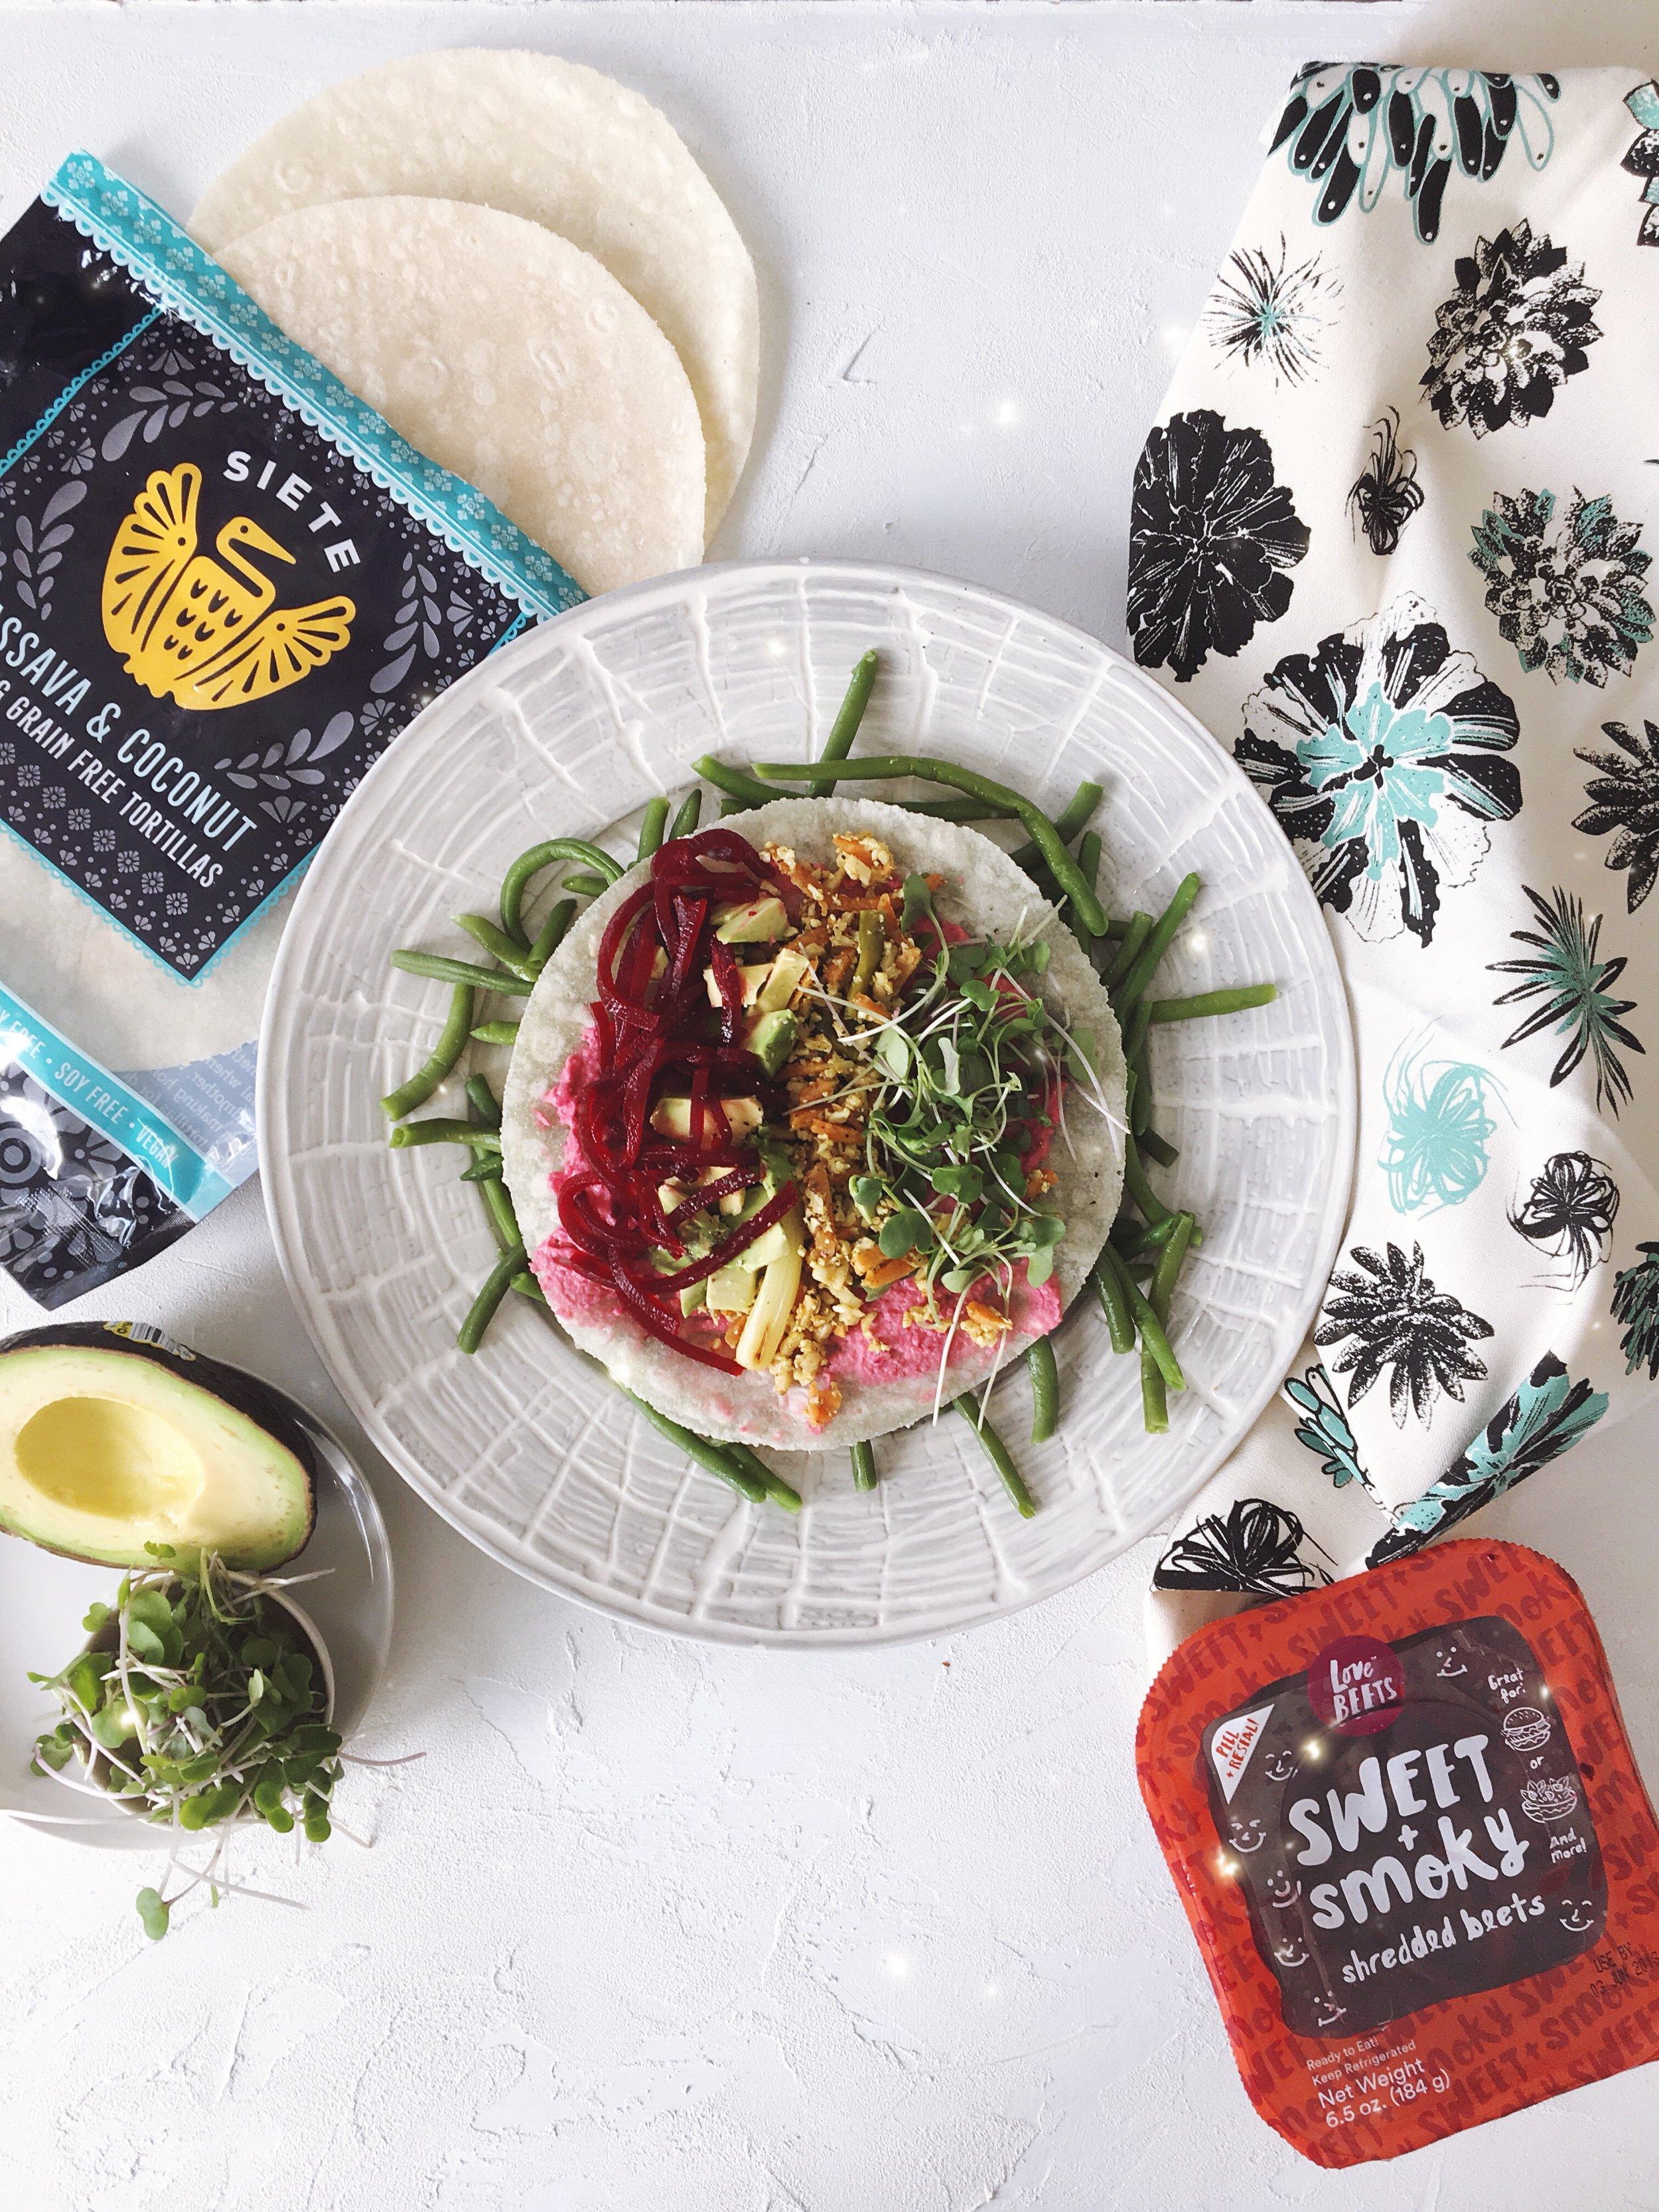 enchanted-by-sunlight-cauliflower-tacos-3.jpg